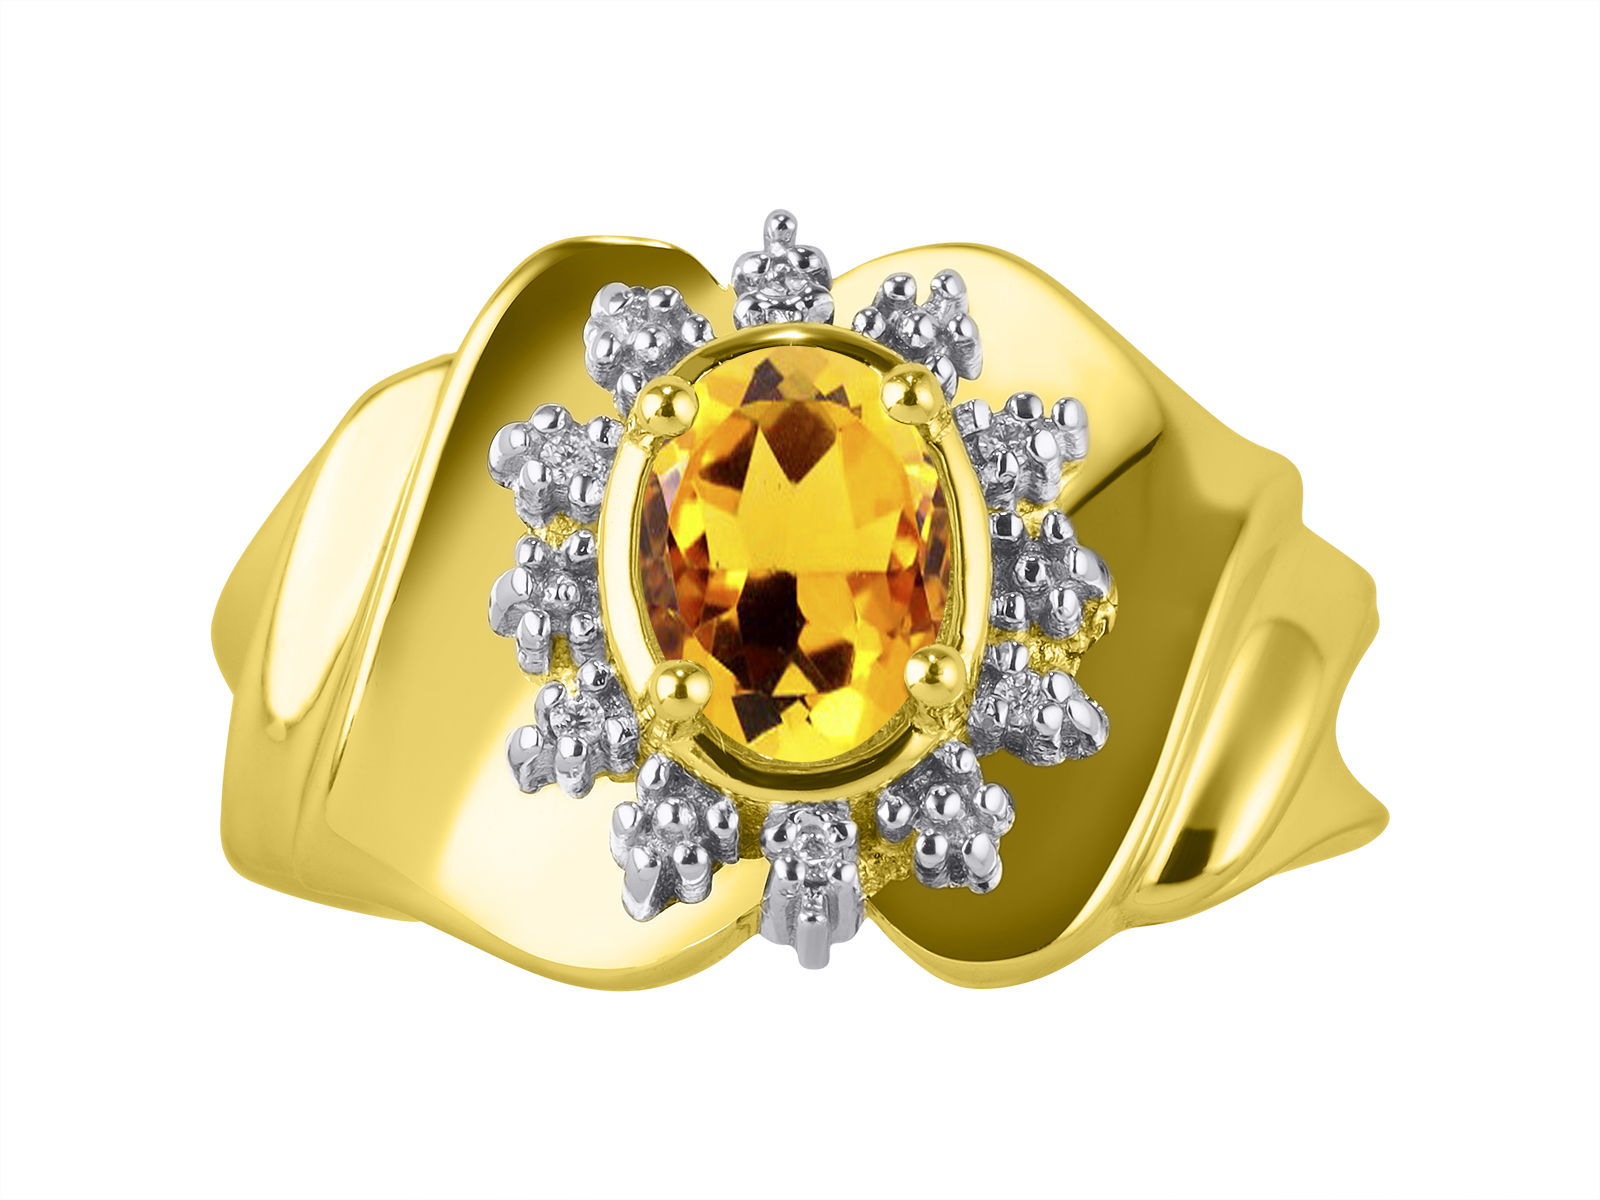 RYLOS Simply Elegant Color Stone   Birthstone / Gem StoneYellow Topaz /  Citrine & Diamond Ring   November Birthstone